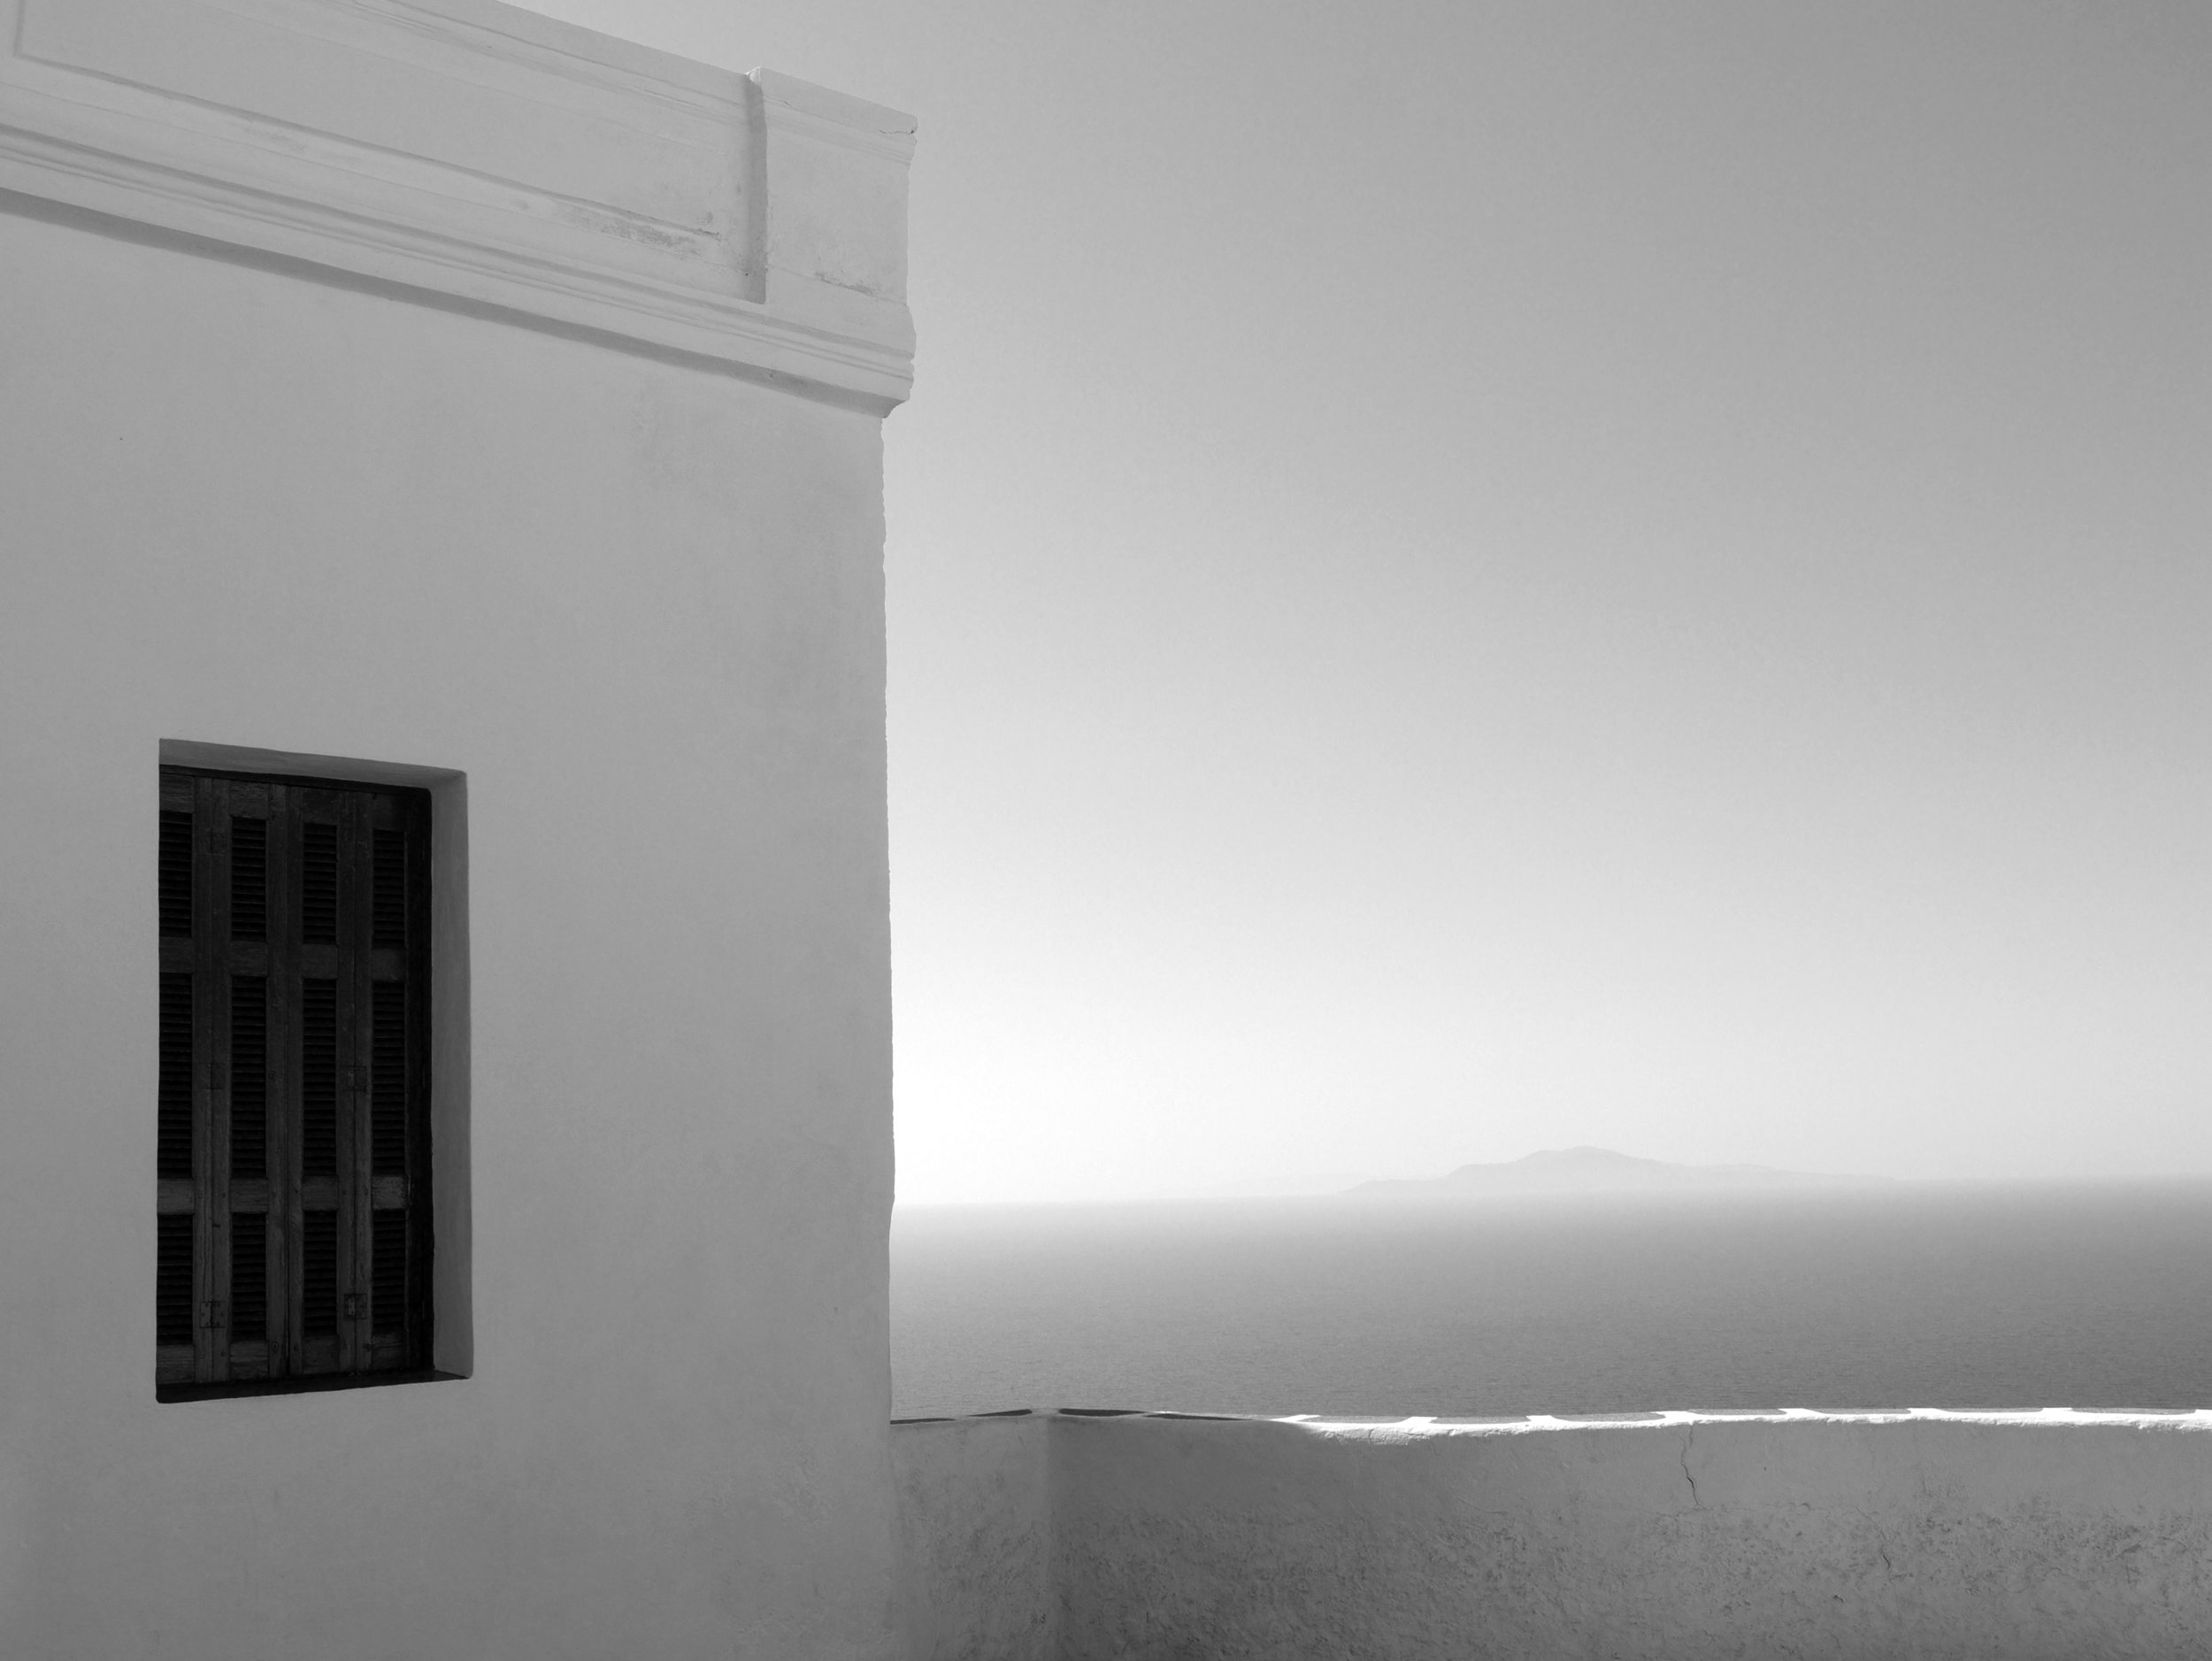 CH_Chora_Folegandros_Greece_2013_008.jpg